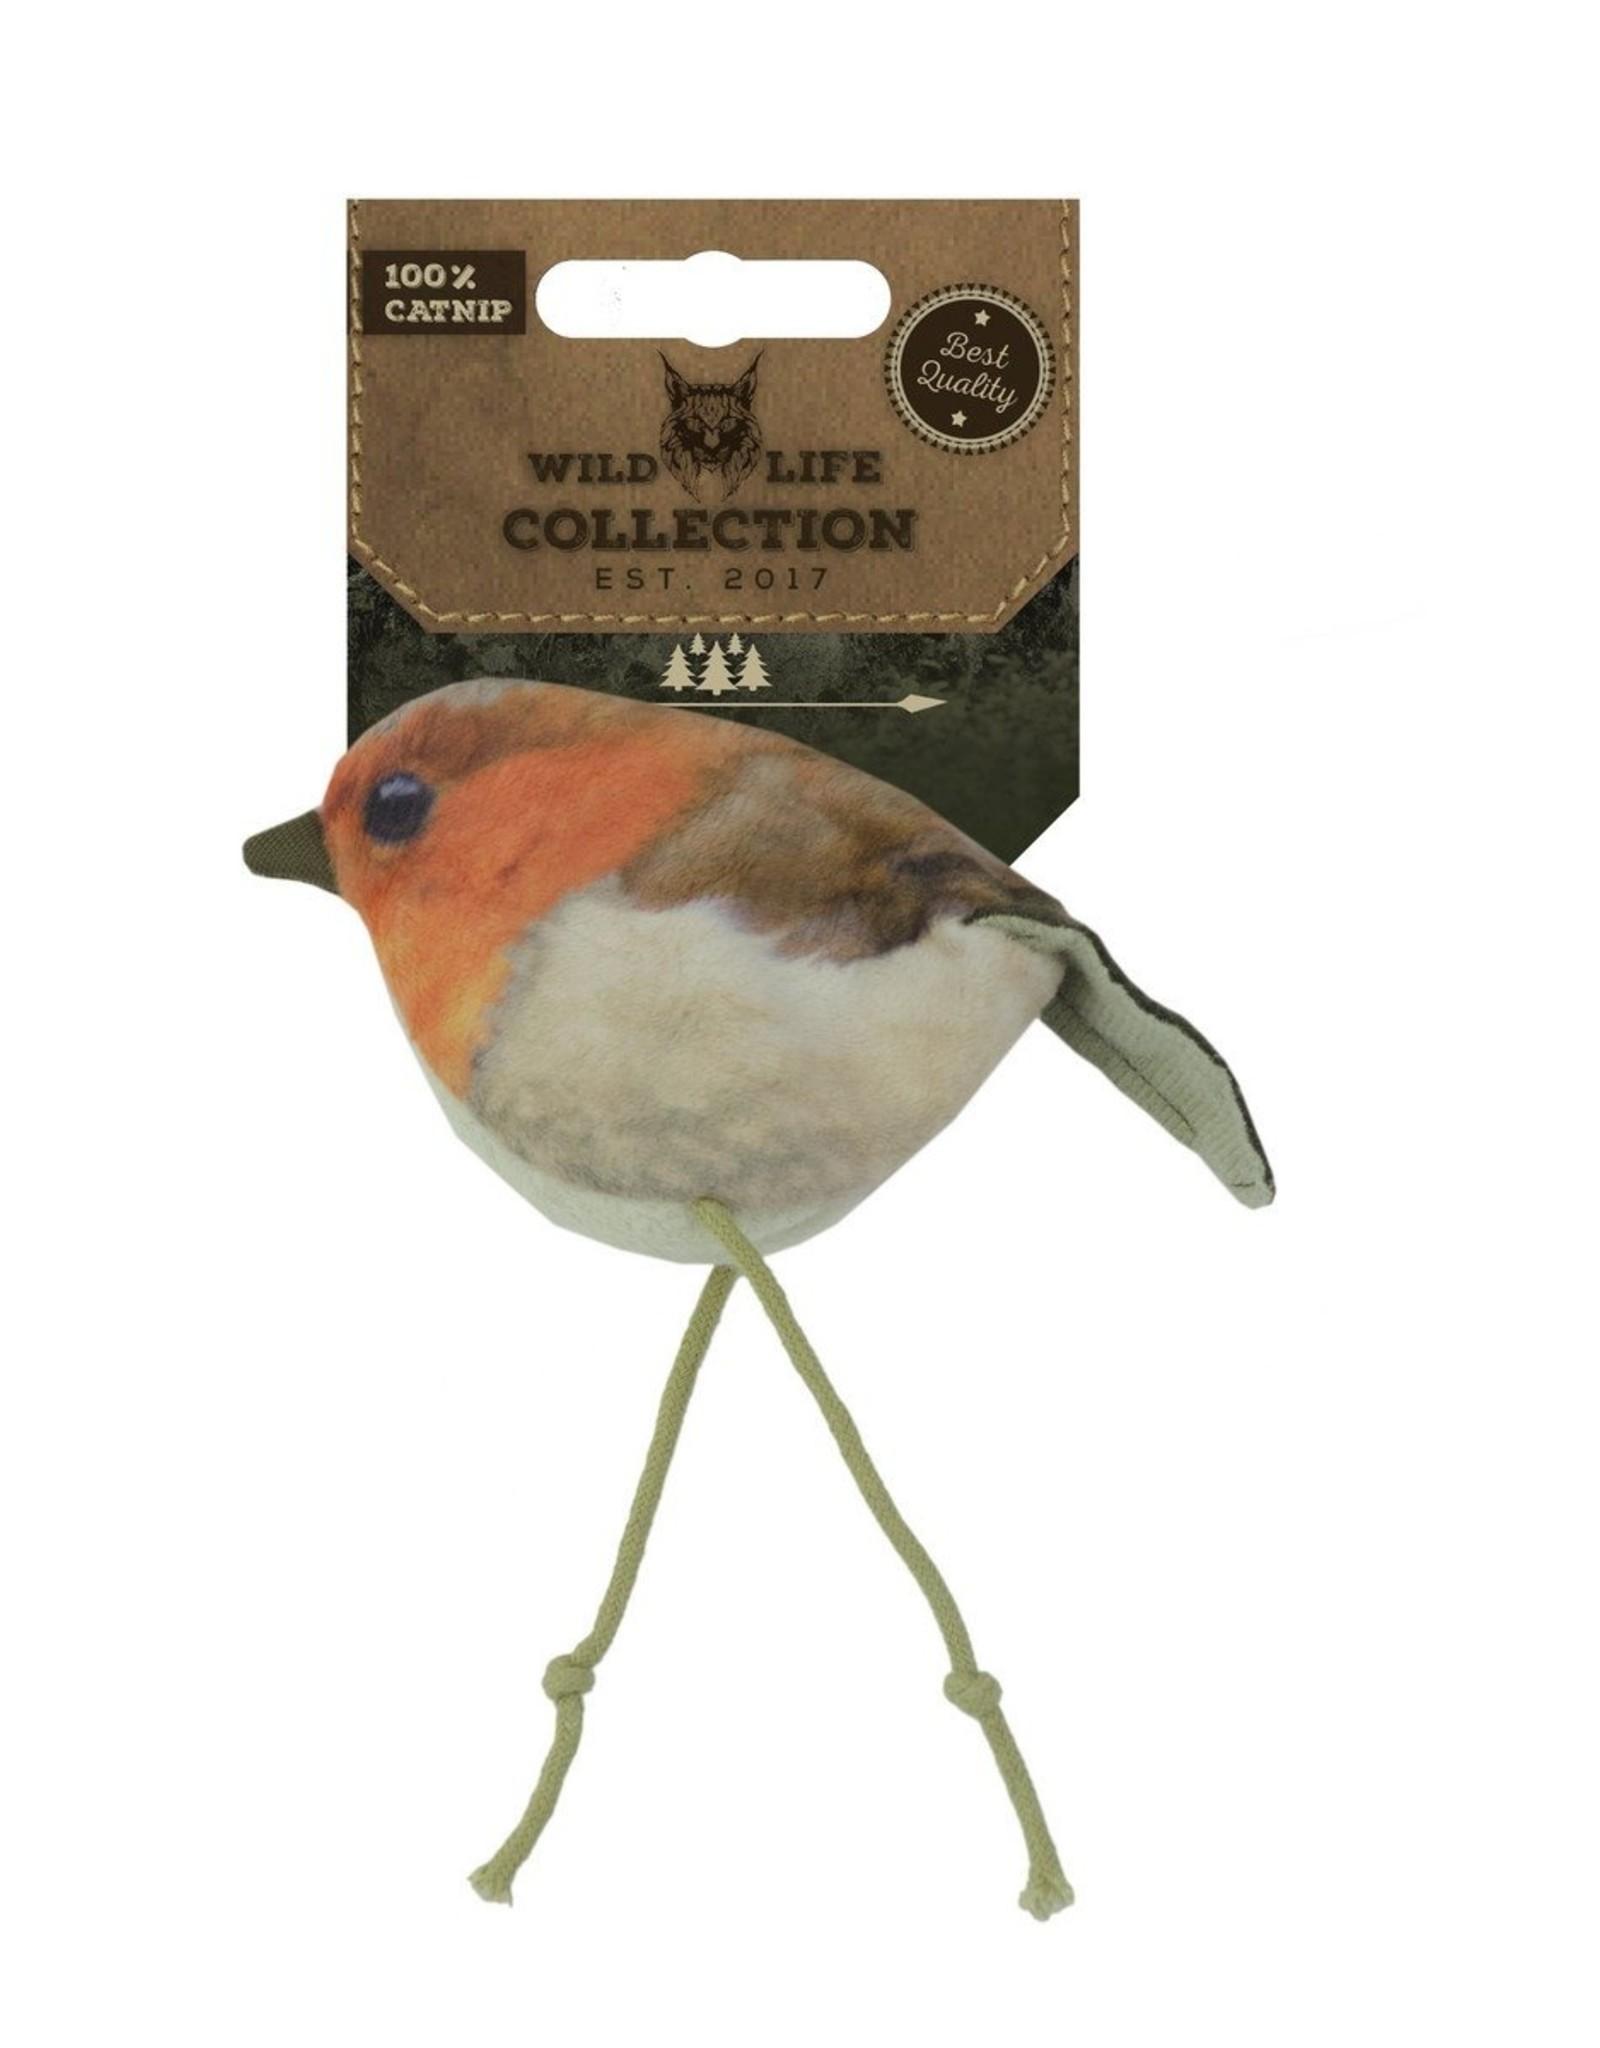 Wild Life Collection- Roodborstje (robin)